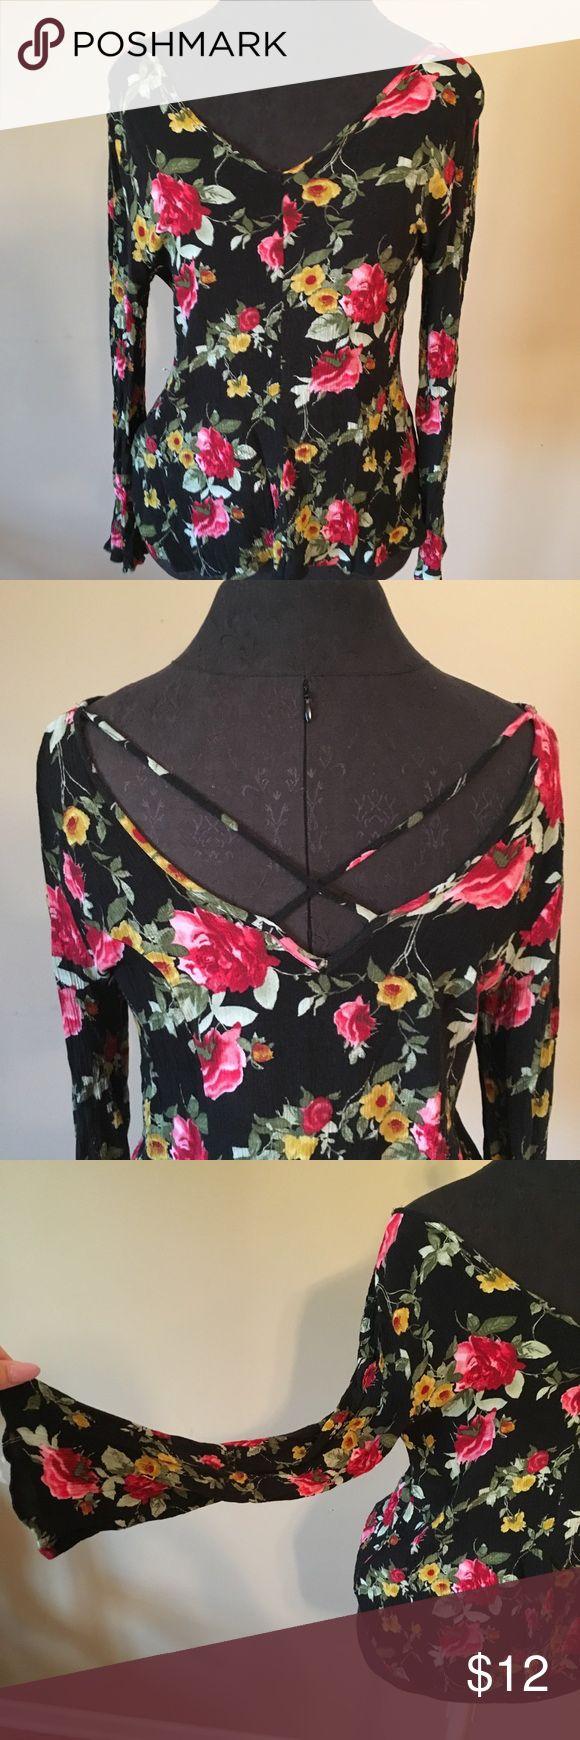 Beautiful floral crepe blouse Beautiful floral crepe blouse Charlotte Russe Tops Blouses